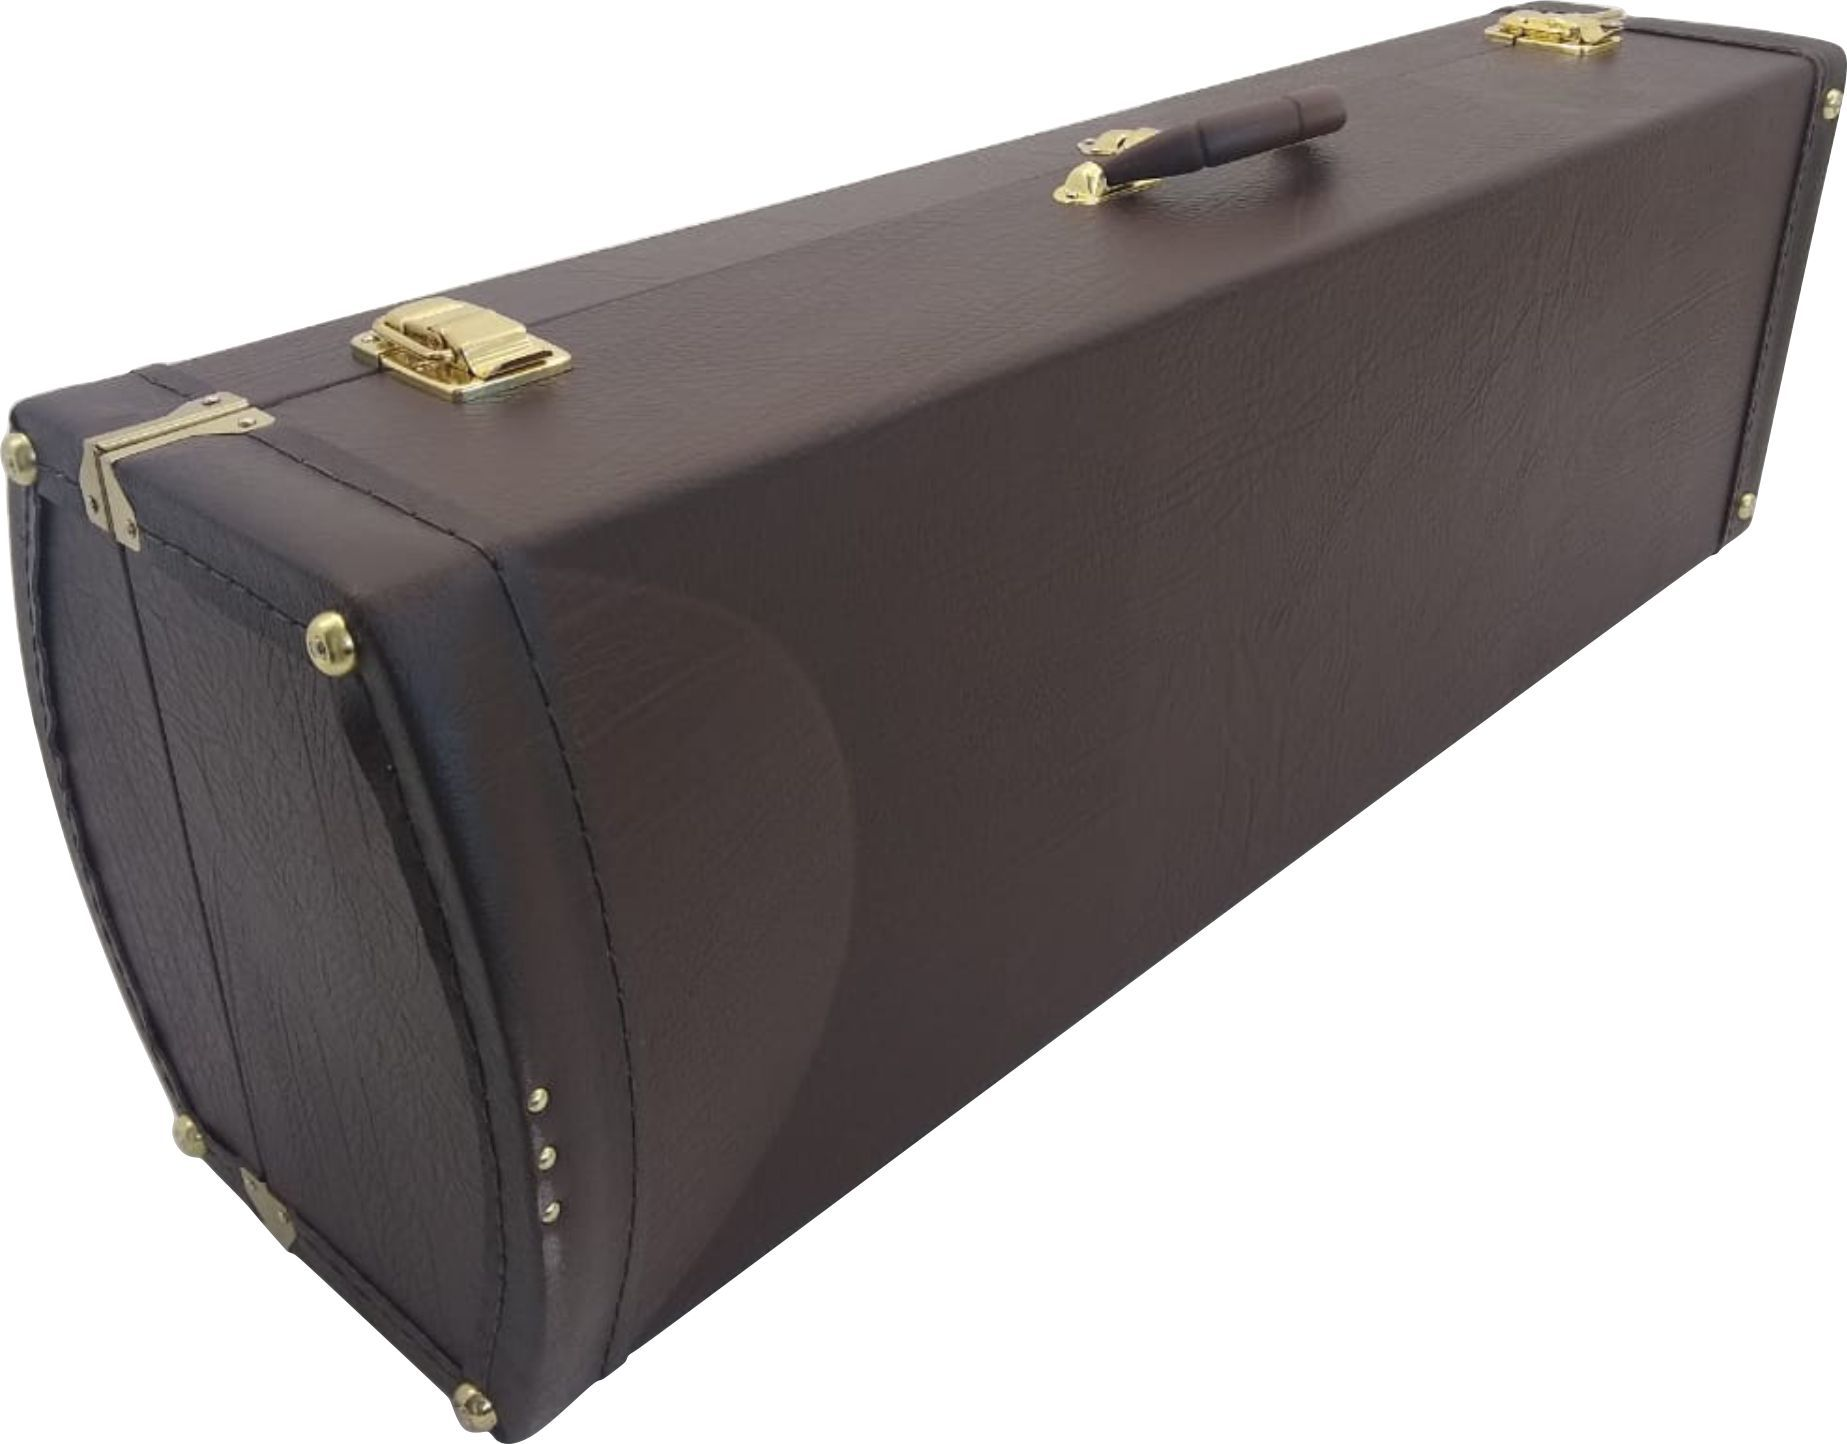 Estojo Case Para Trombone Médio Extra Luxo